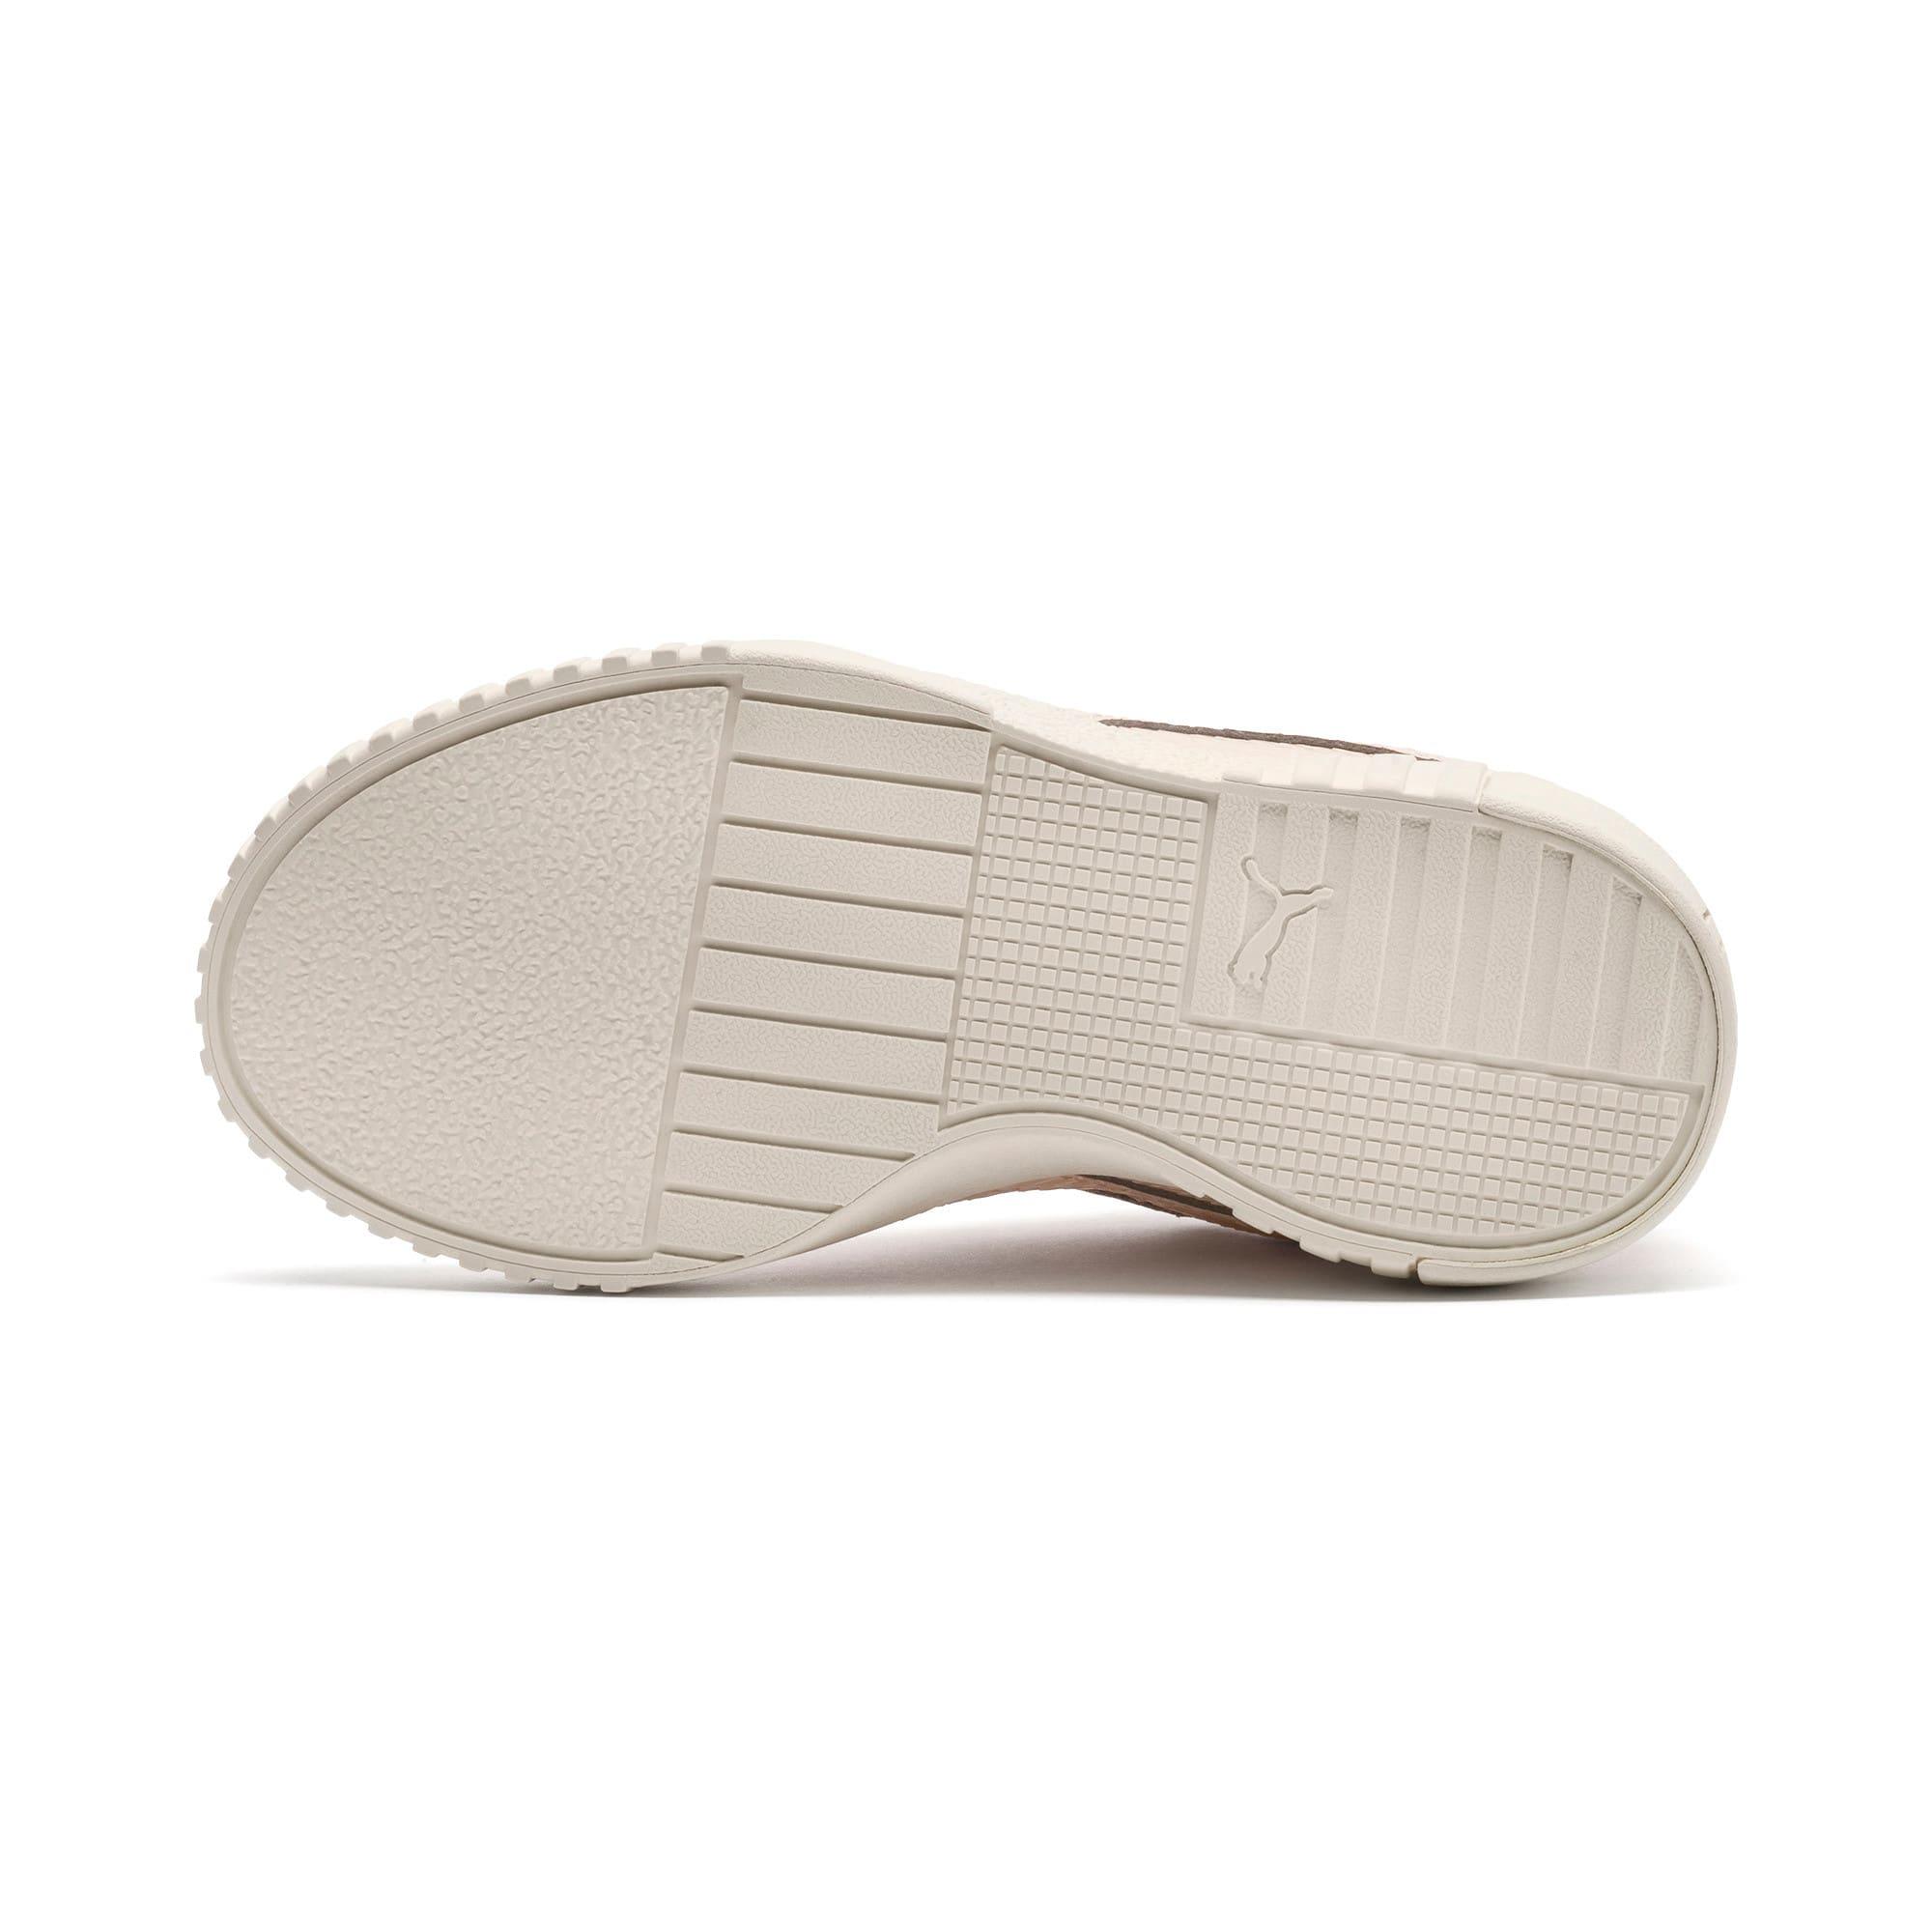 Imagen en miniatura 4 de Zapatillas de niña Cali Emboss Kid, Cream Tan-Cream Tan, mediana